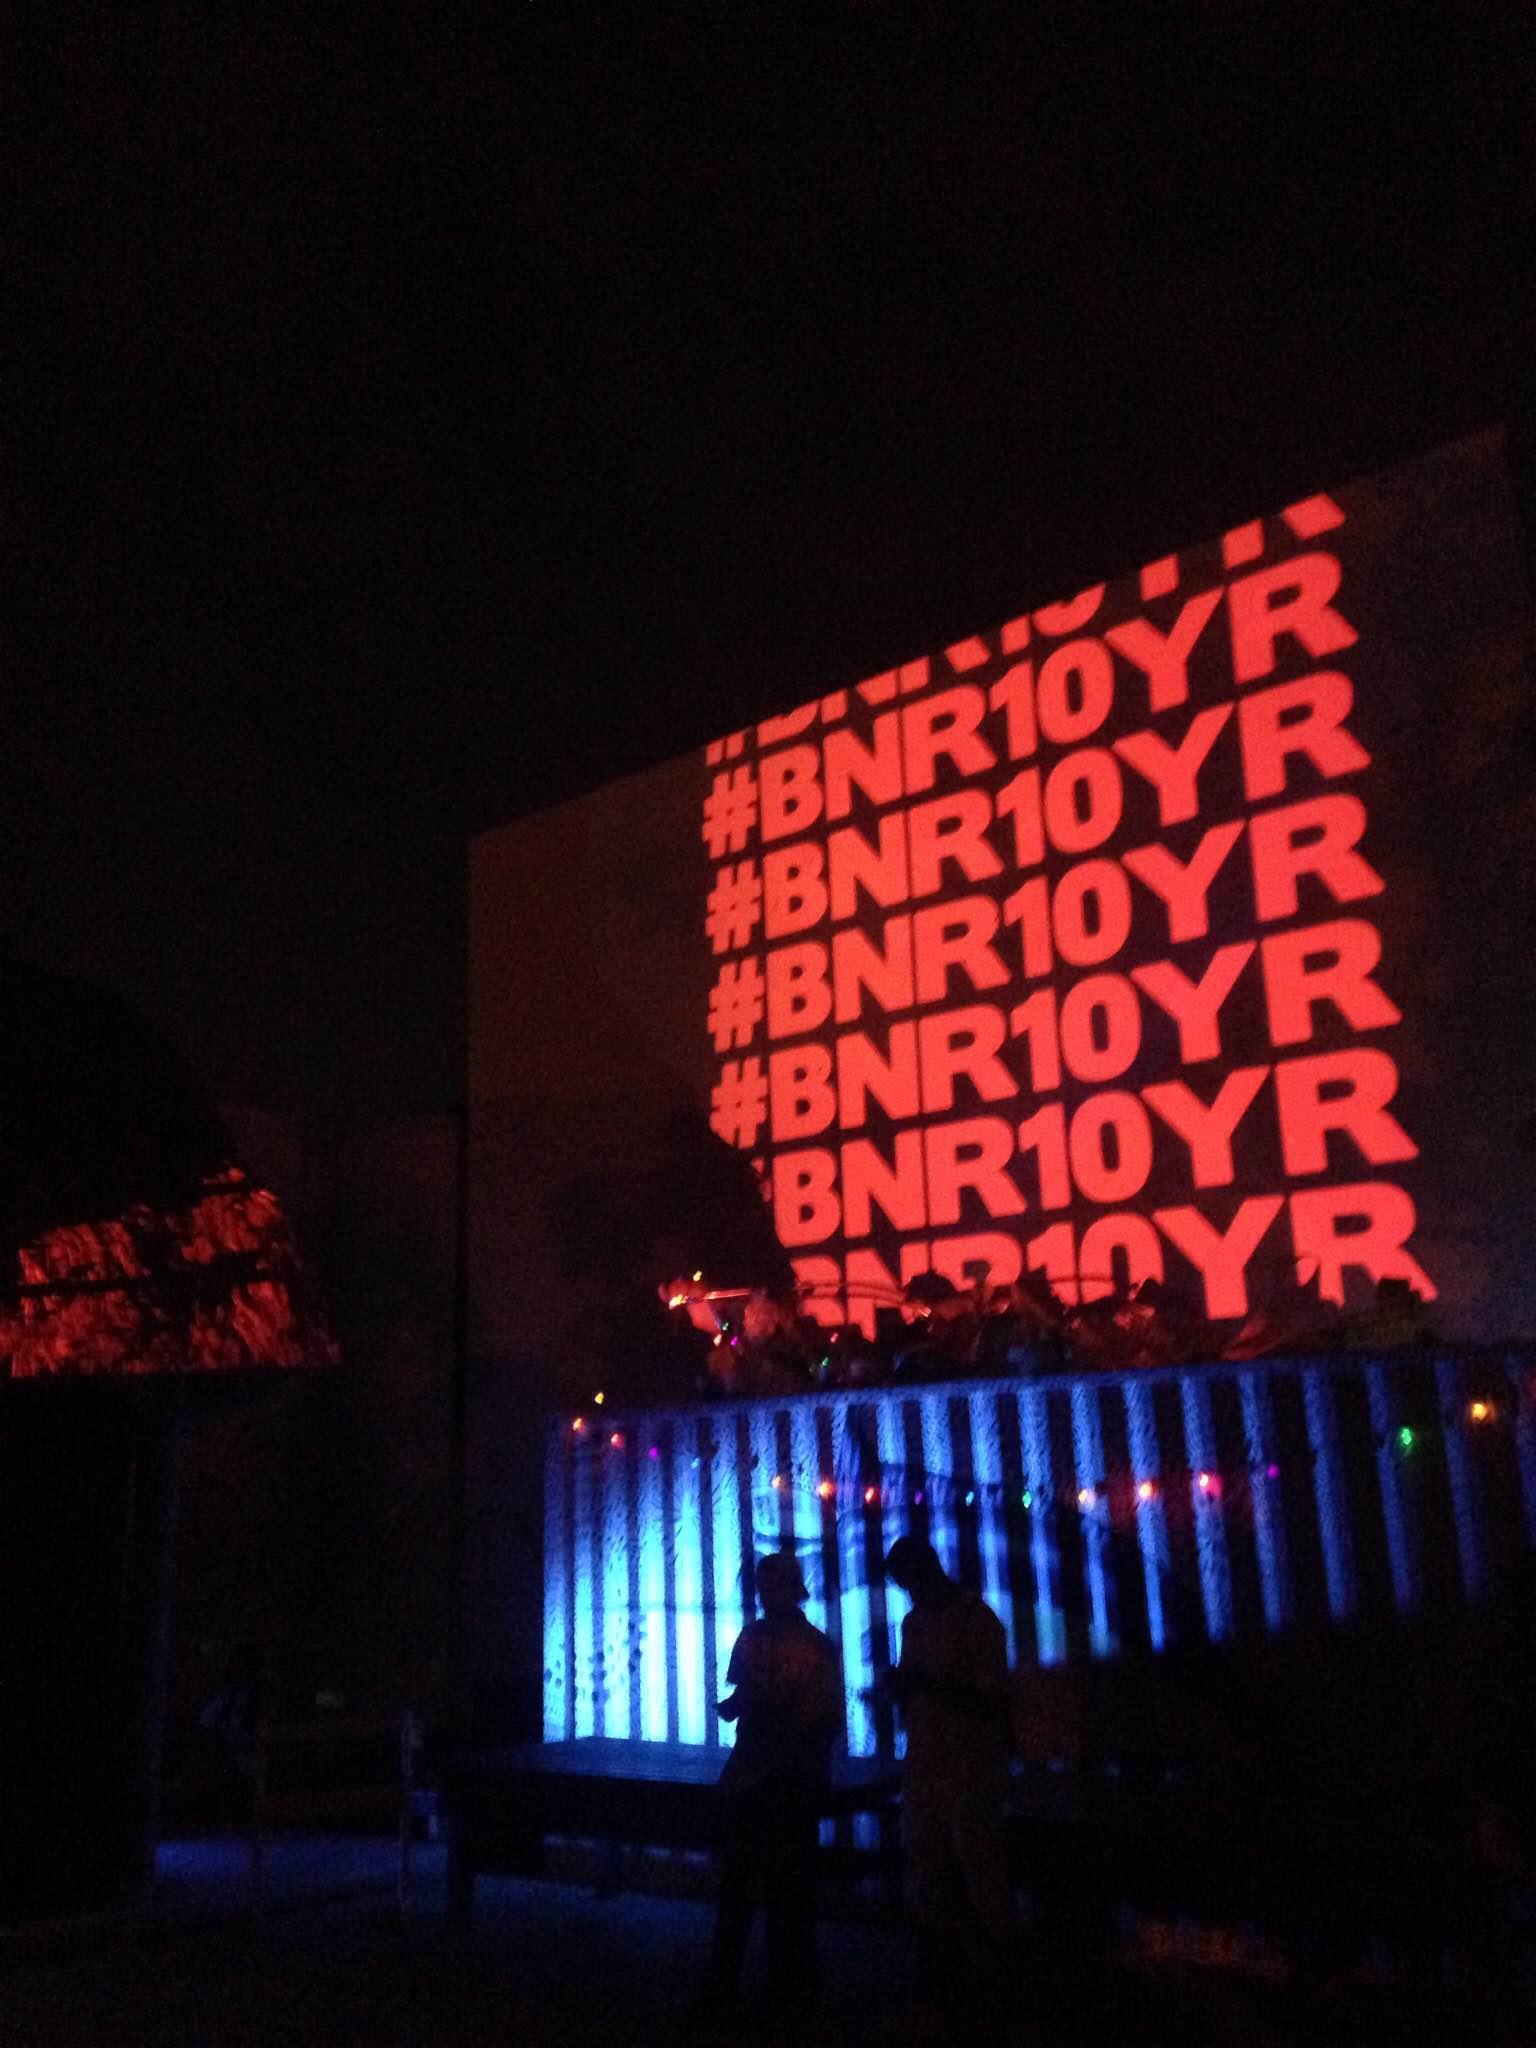 Miami Music Week BNR10YR